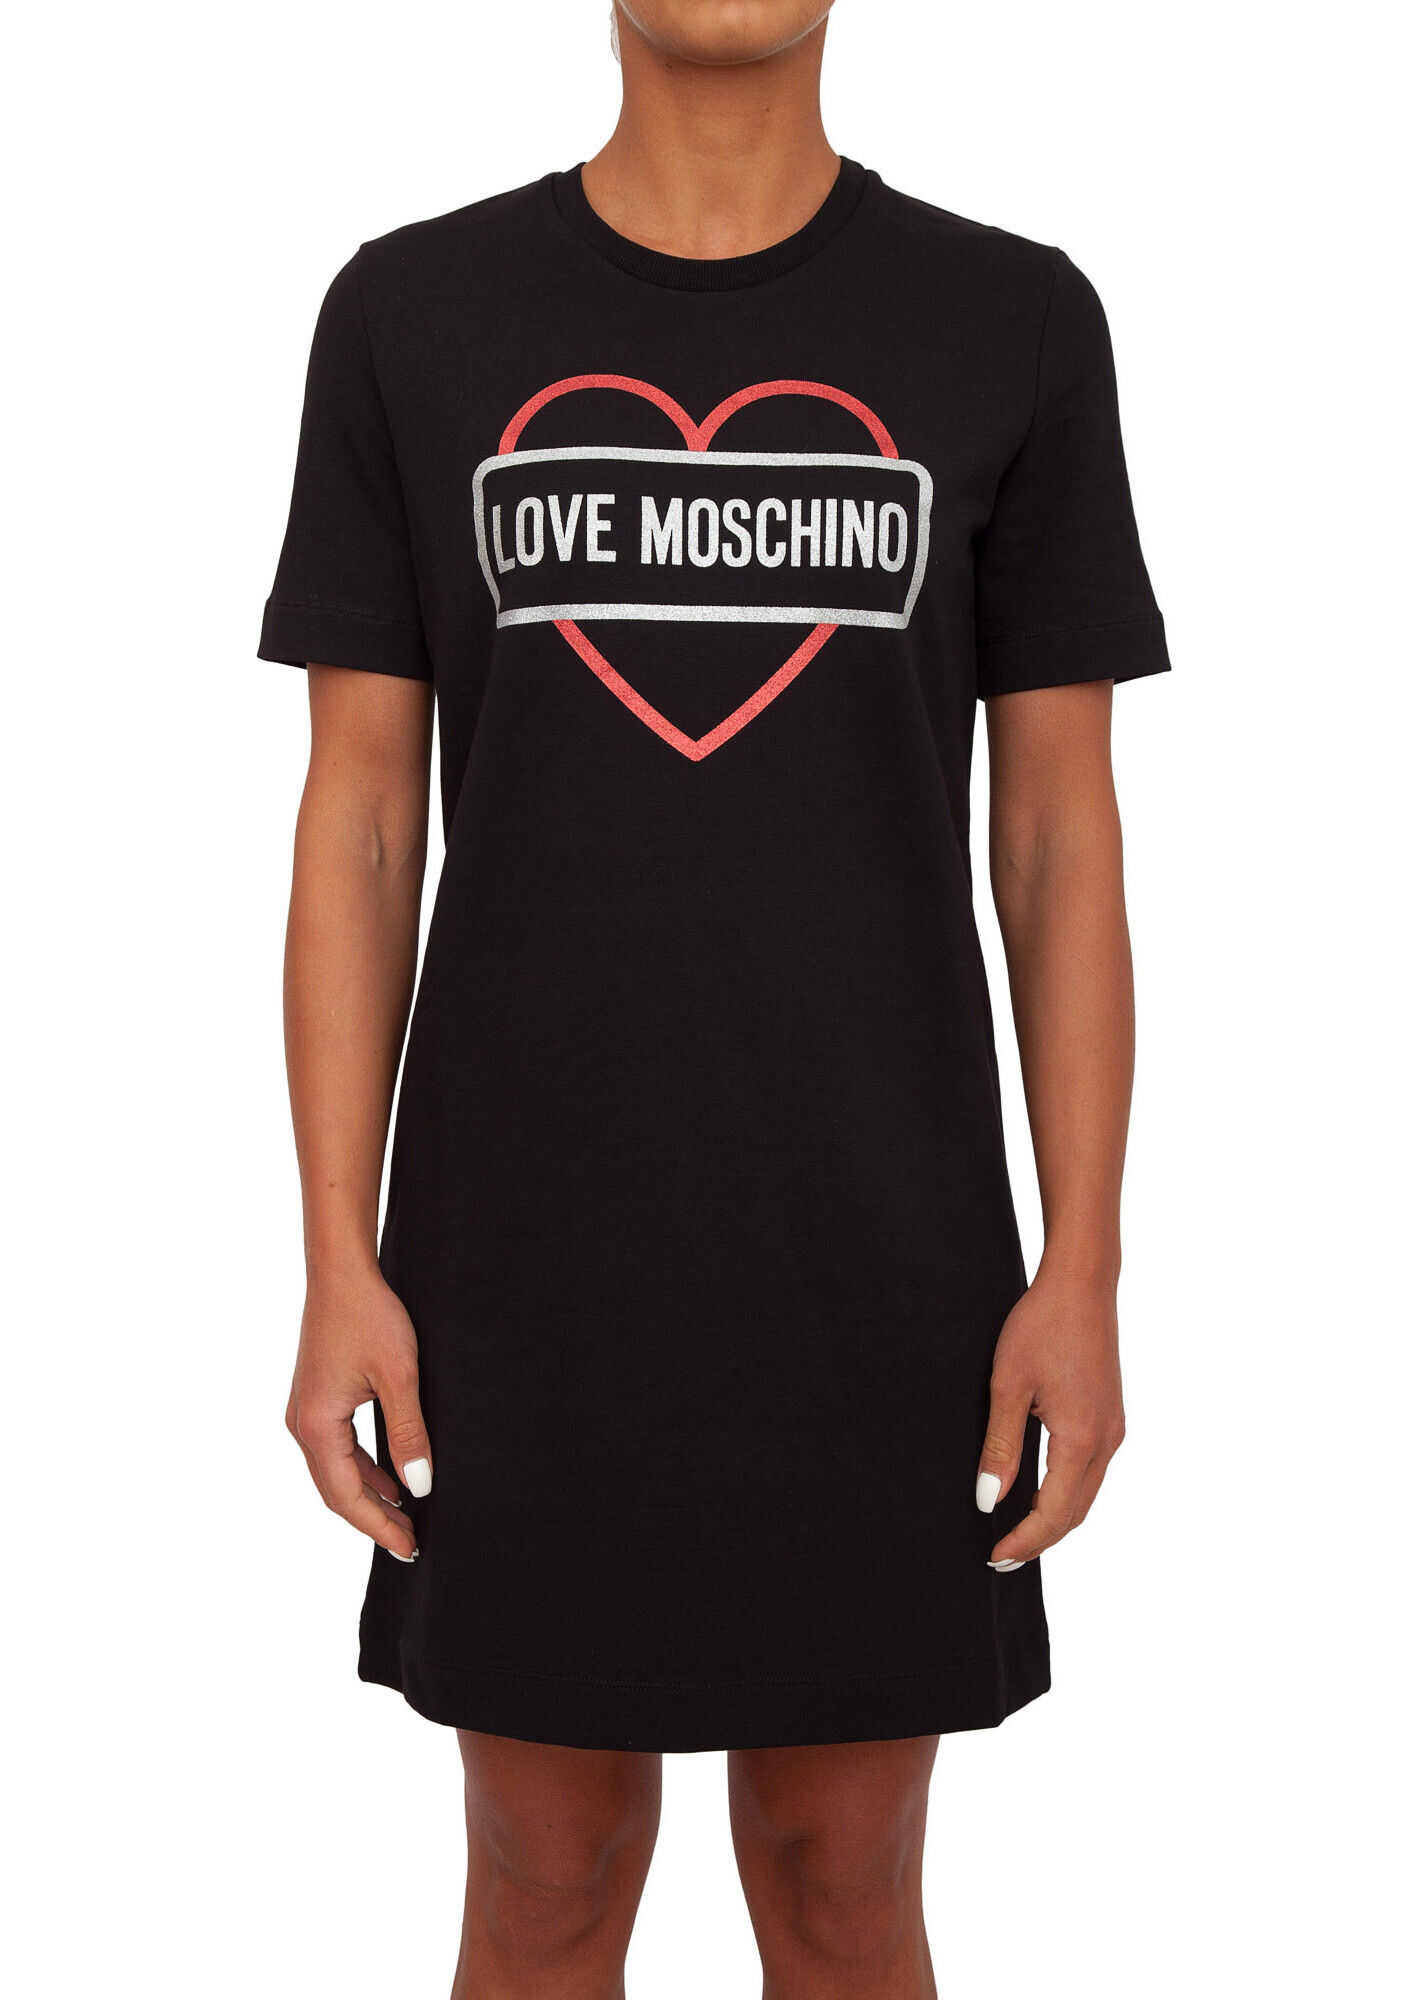 LOVE Moschino F34BD38B BLACK